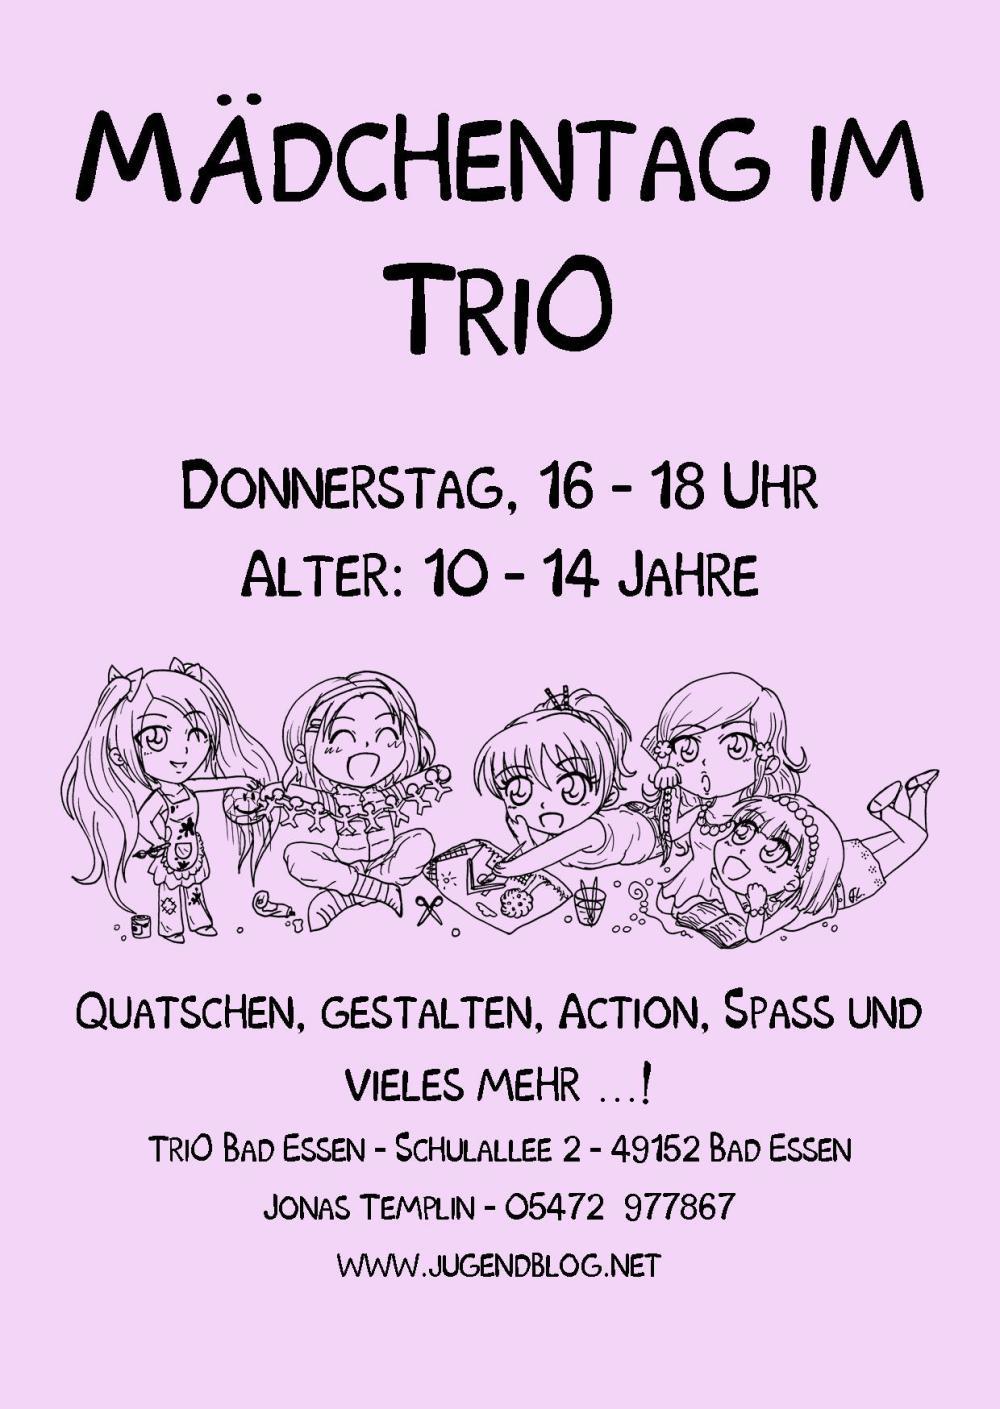 Mädchentag TriO Front Web